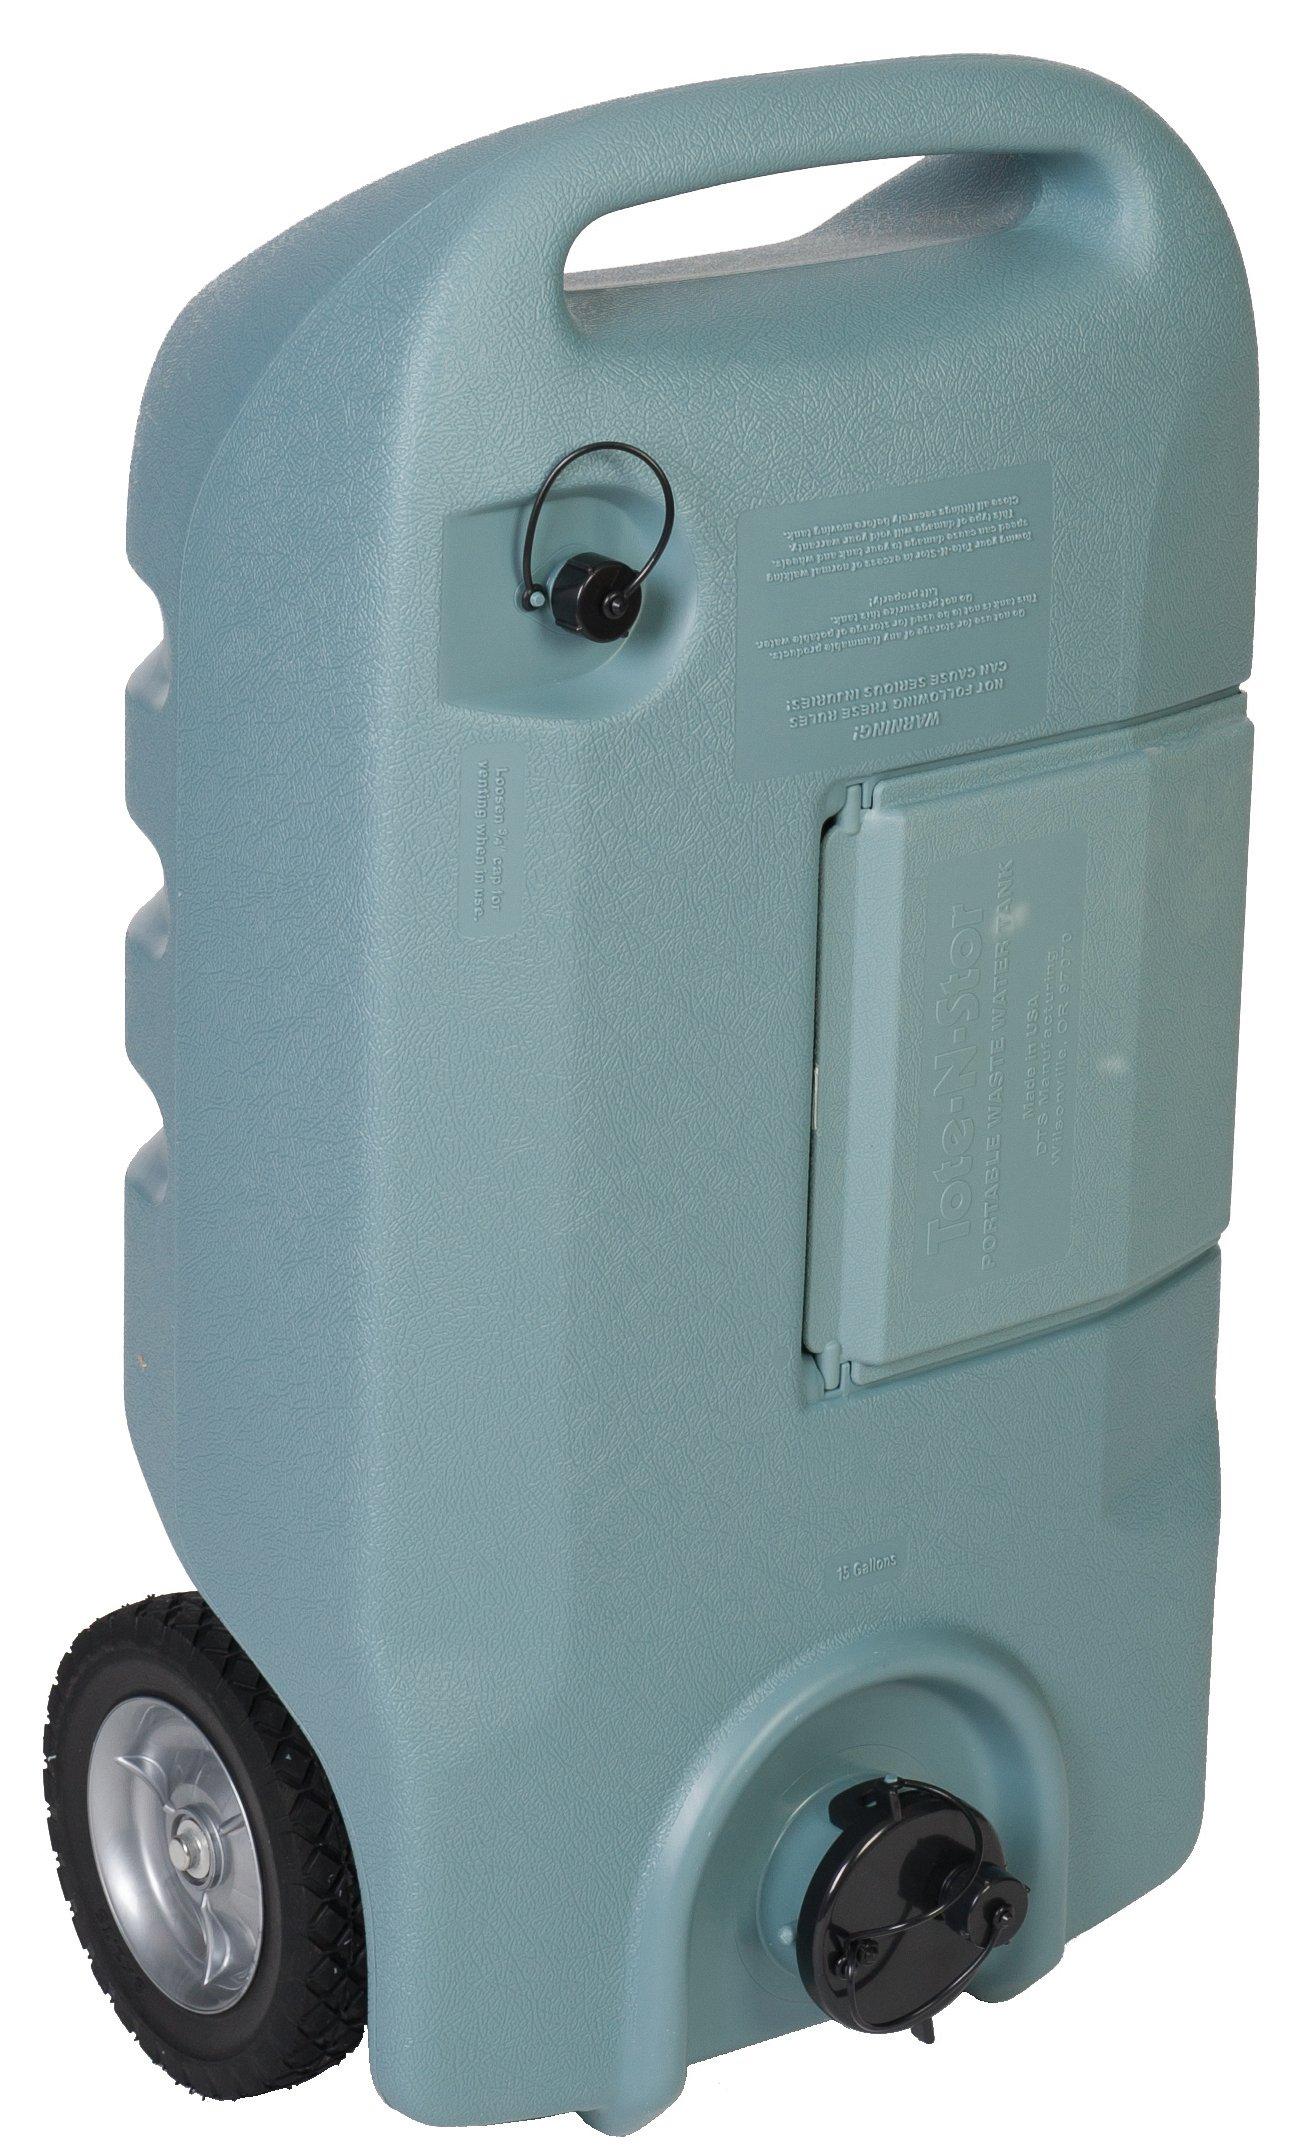 Portable Rv Tanks : Rv portable waste transport wheel trailer sewer black